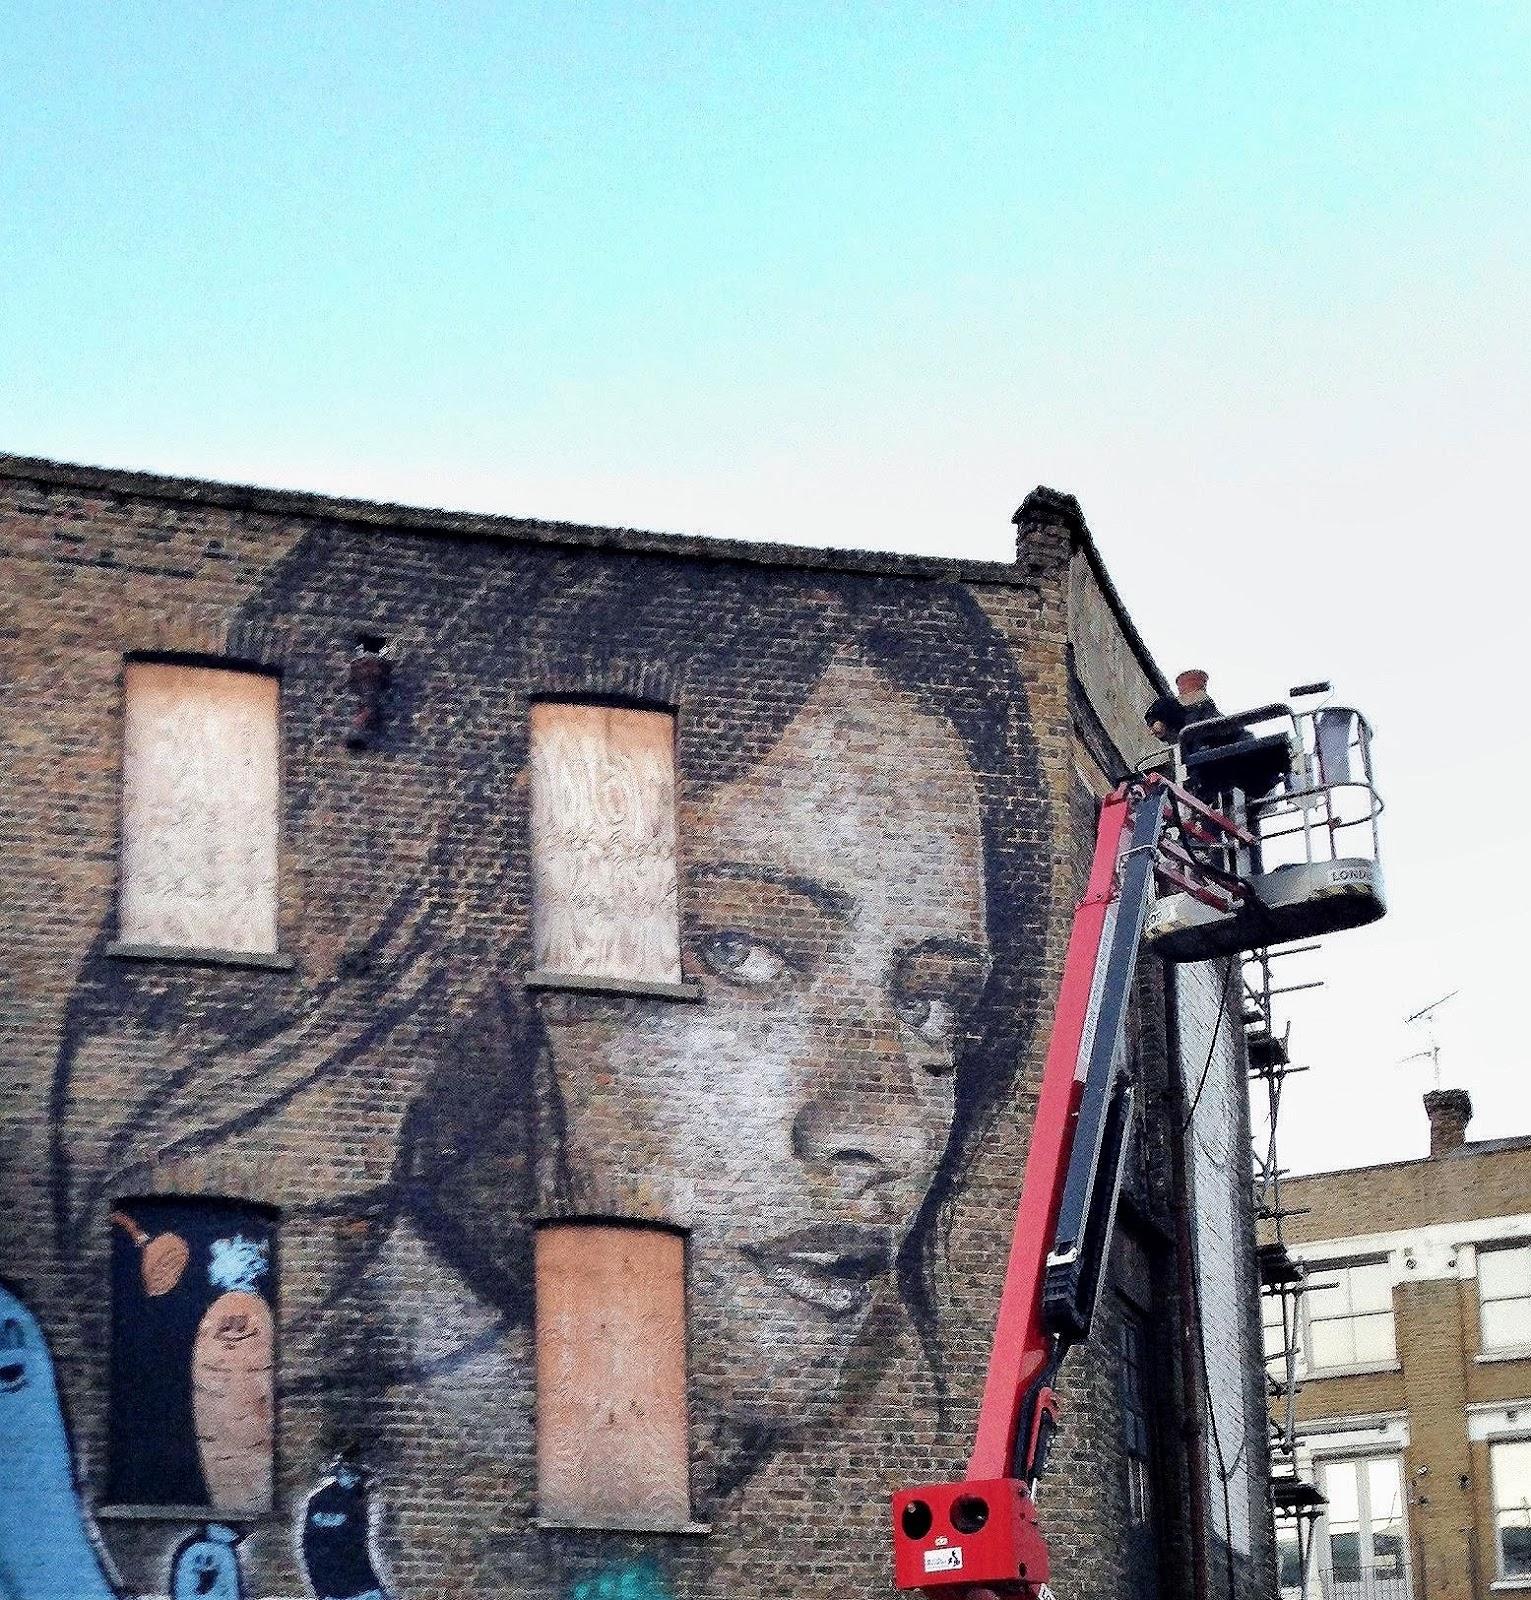 streetartnews_rone_london_uk-9